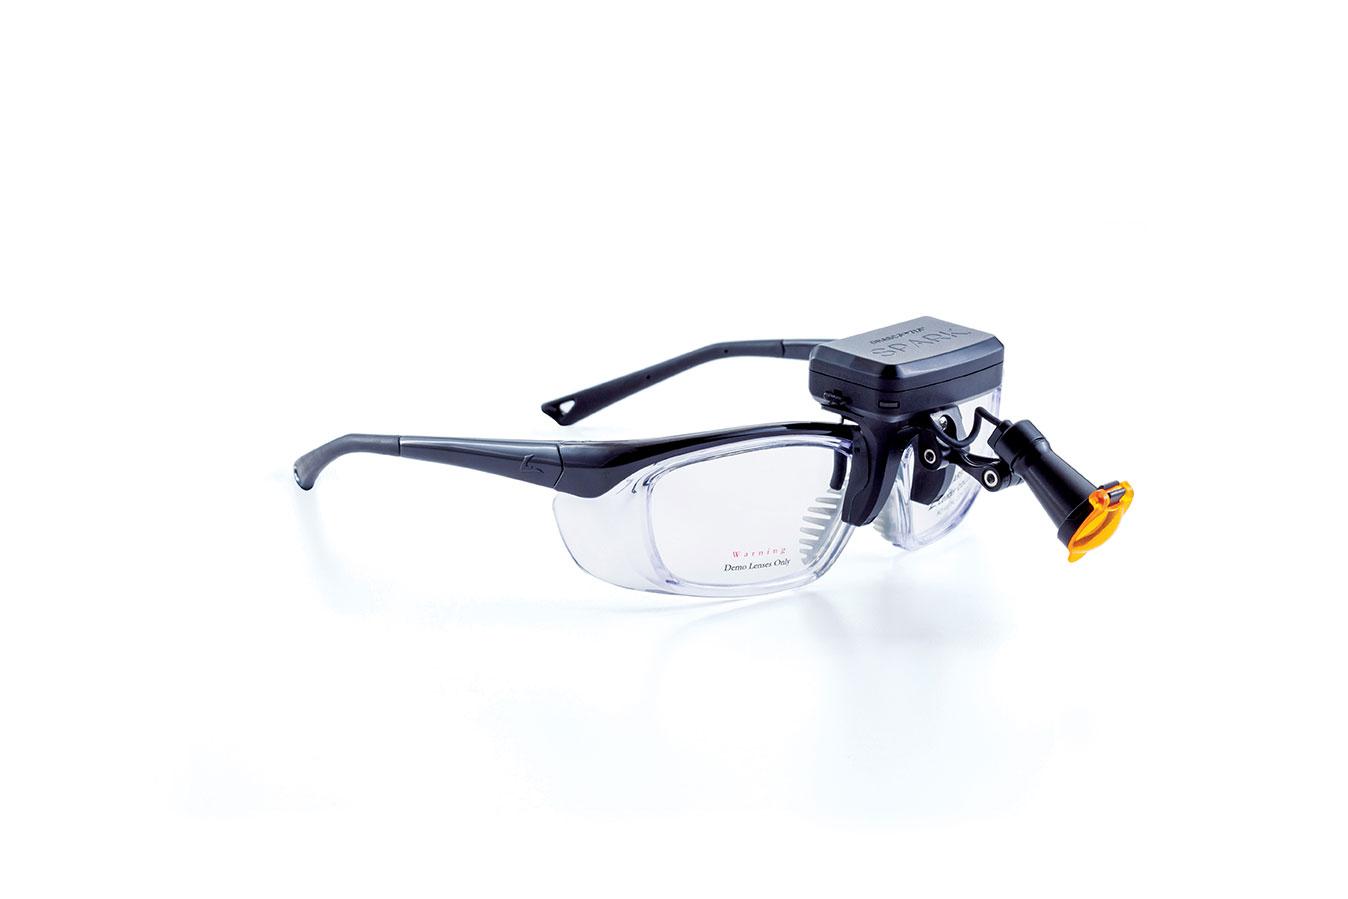 Orascoptic Safety Glasses